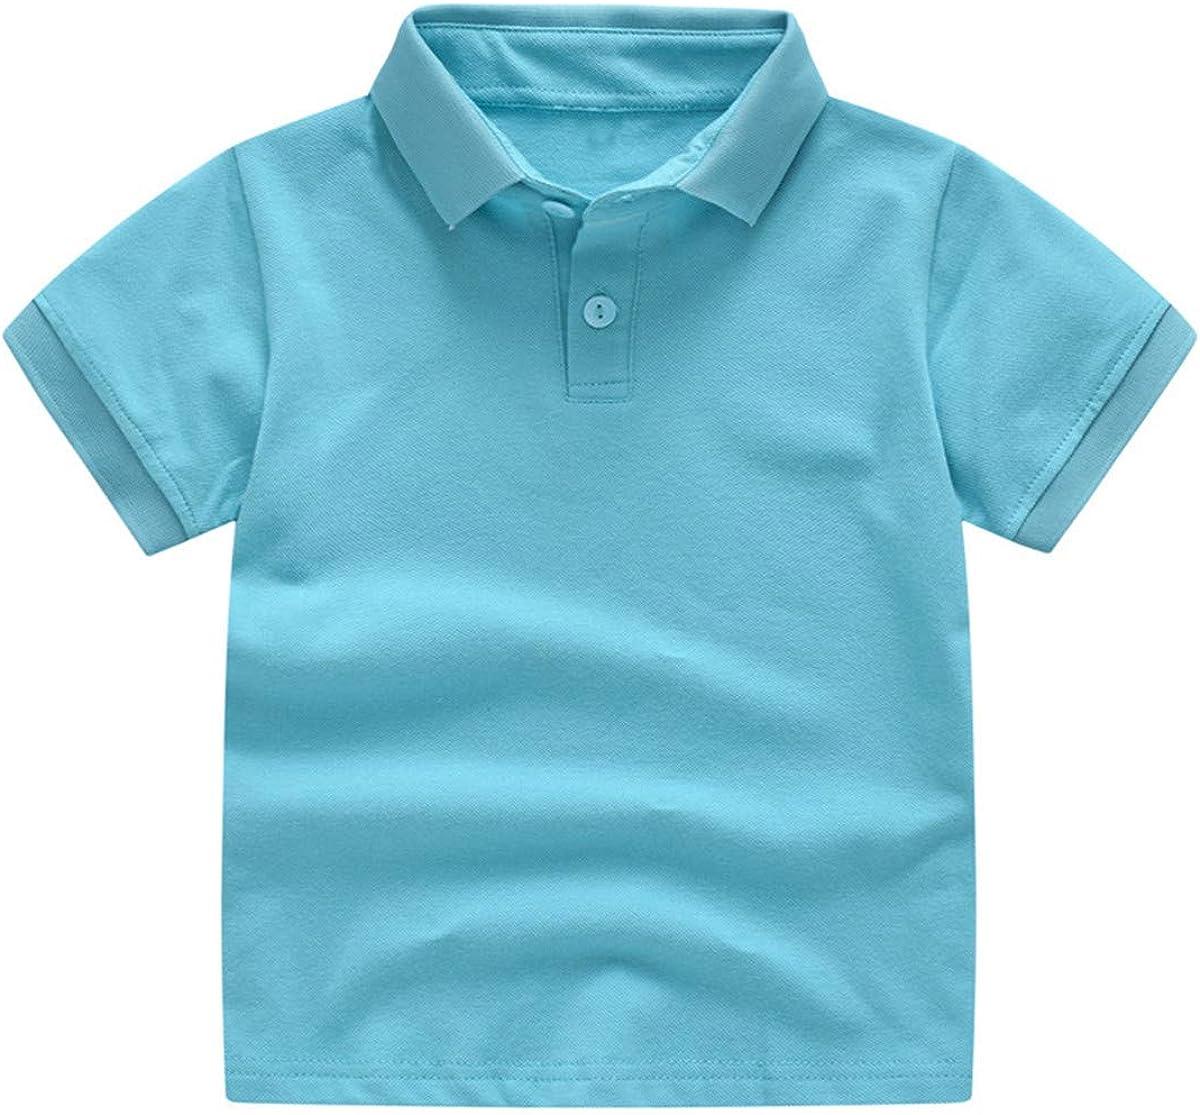 RACHAPE Boys' Short Sleeve Pique Polo Children's Solid Deck School Uniform Shirt